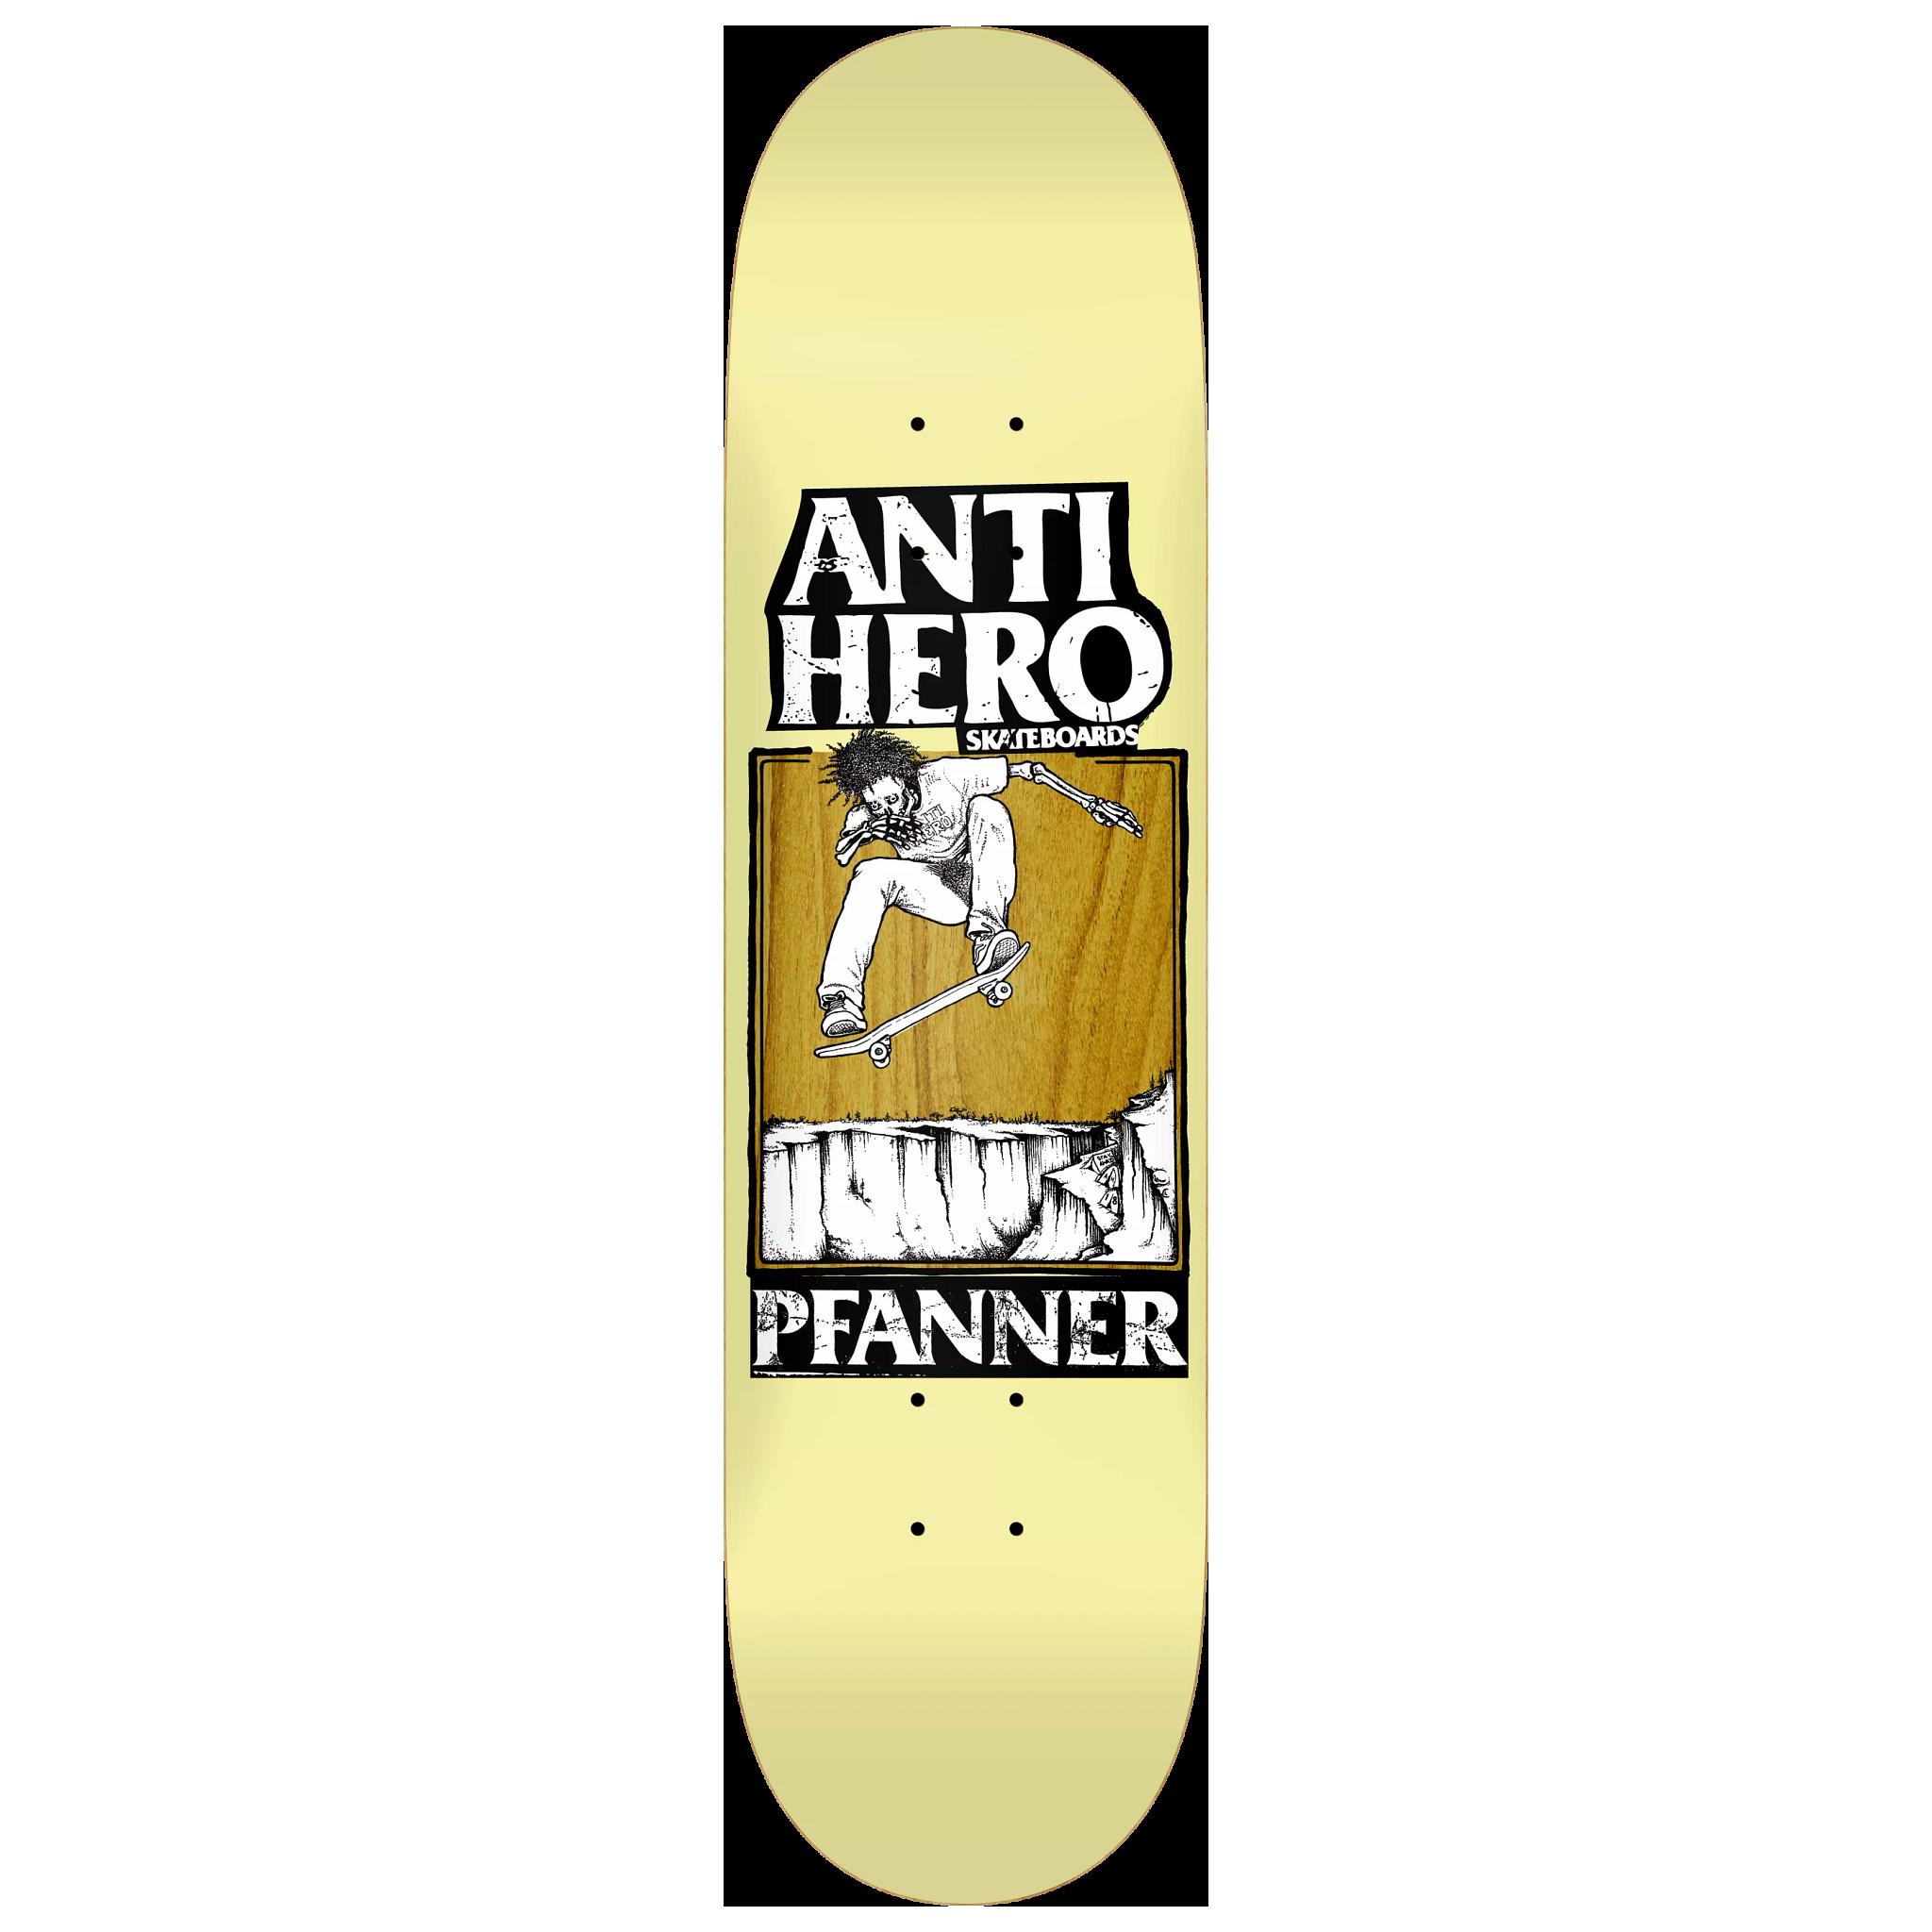 Anti Hero Pfanner x Lance 2 8.5